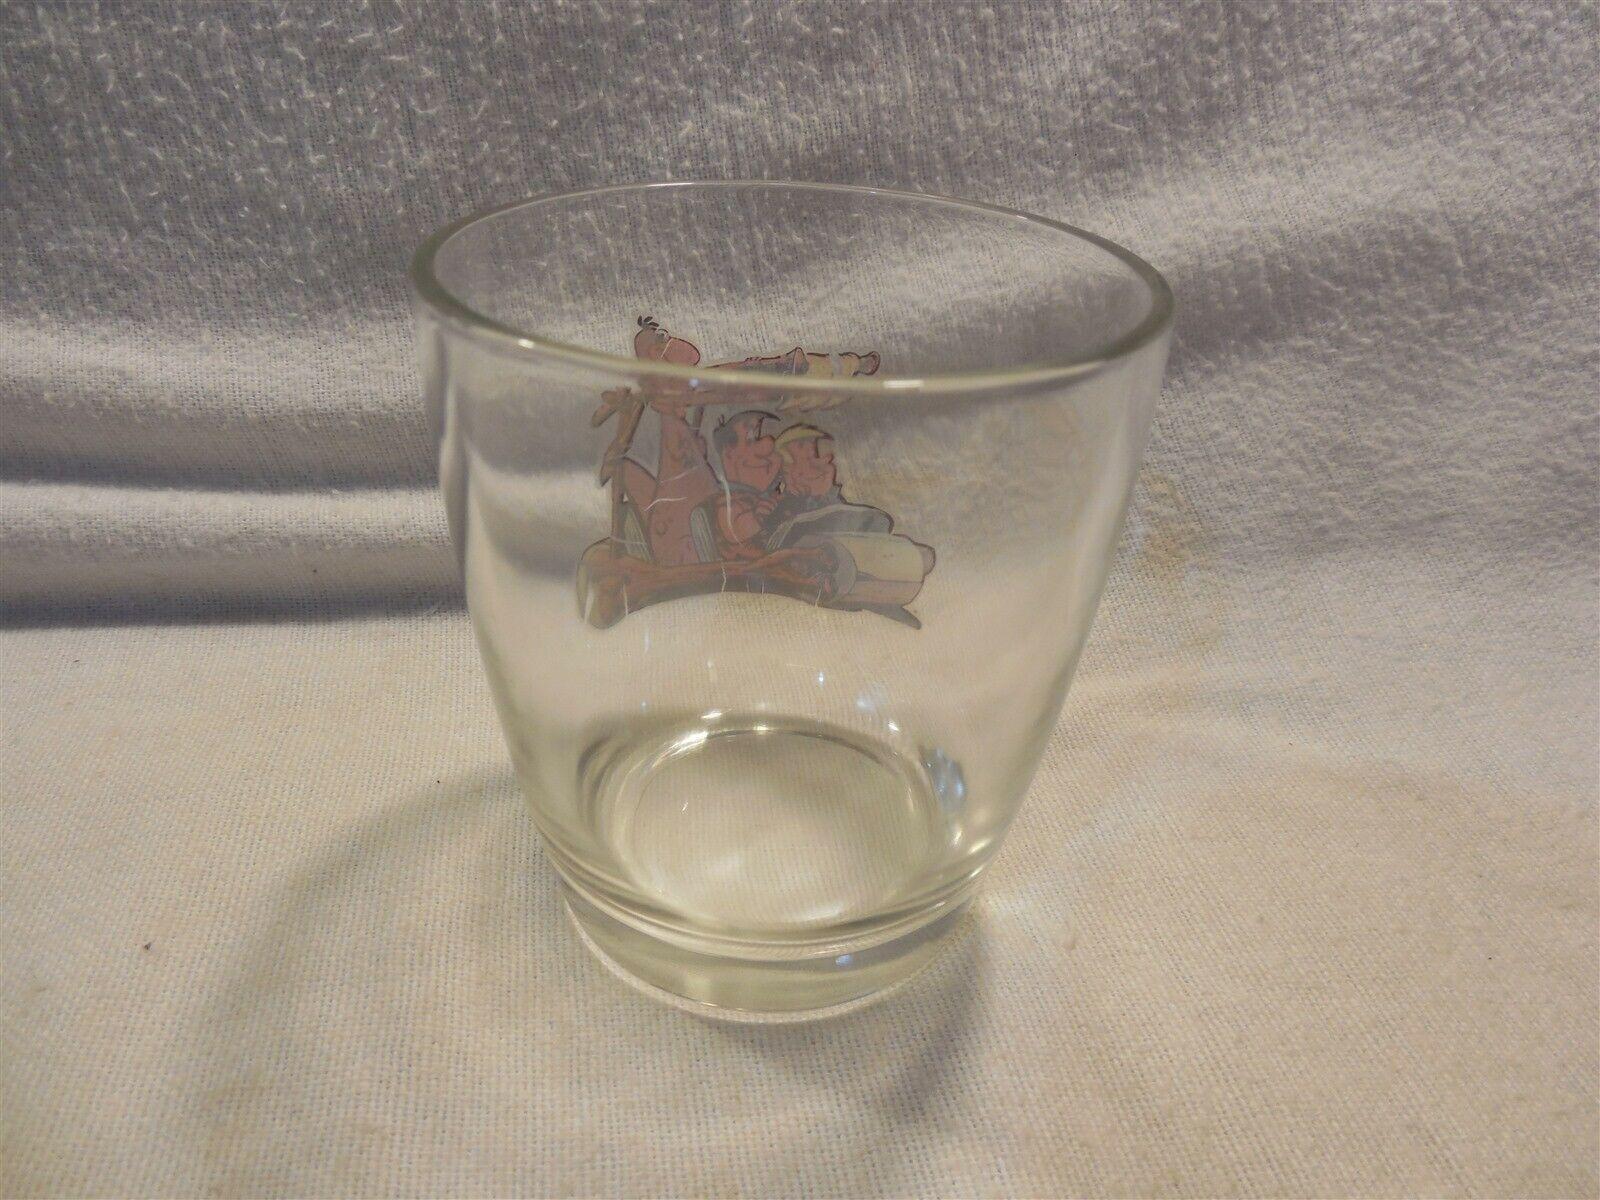 Vintage Flintstones Cocktail Sour Cream Glass Fred, Barney & Dino in Flintmobile